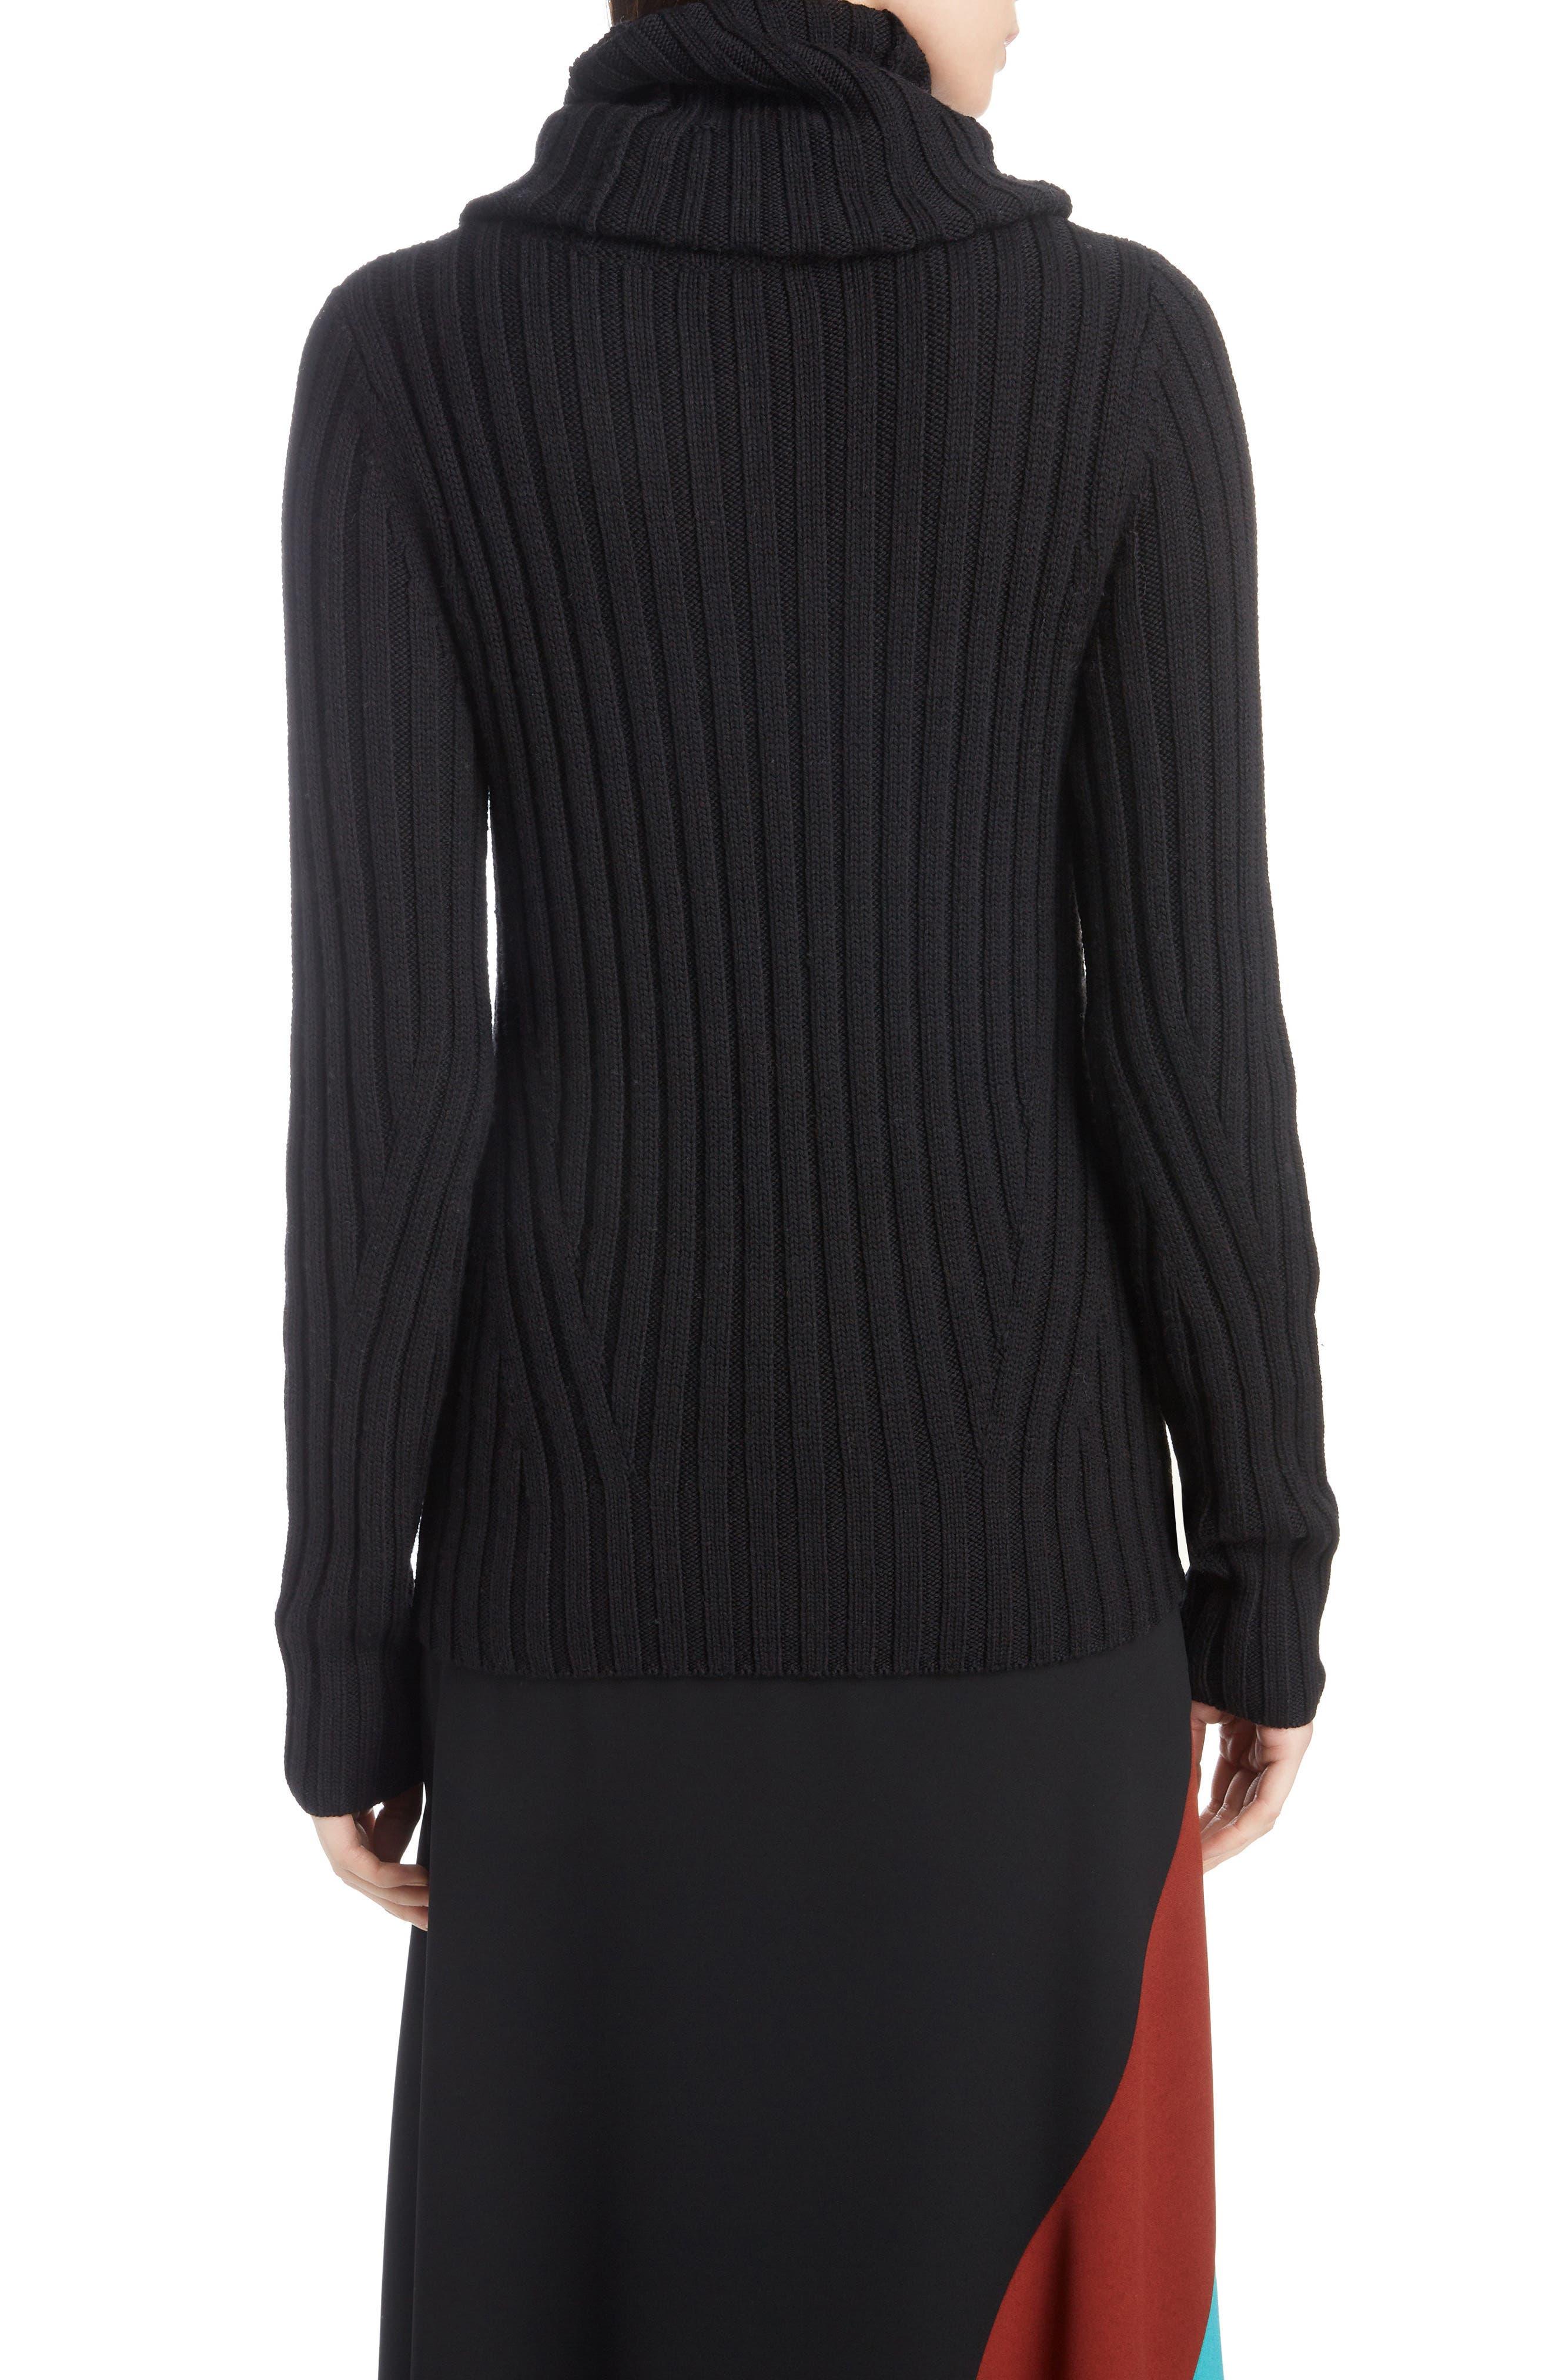 DRIES VAN NOTEN,                             Turtleneck Wool Sweater,                             Alternate thumbnail 2, color,                             BLACK